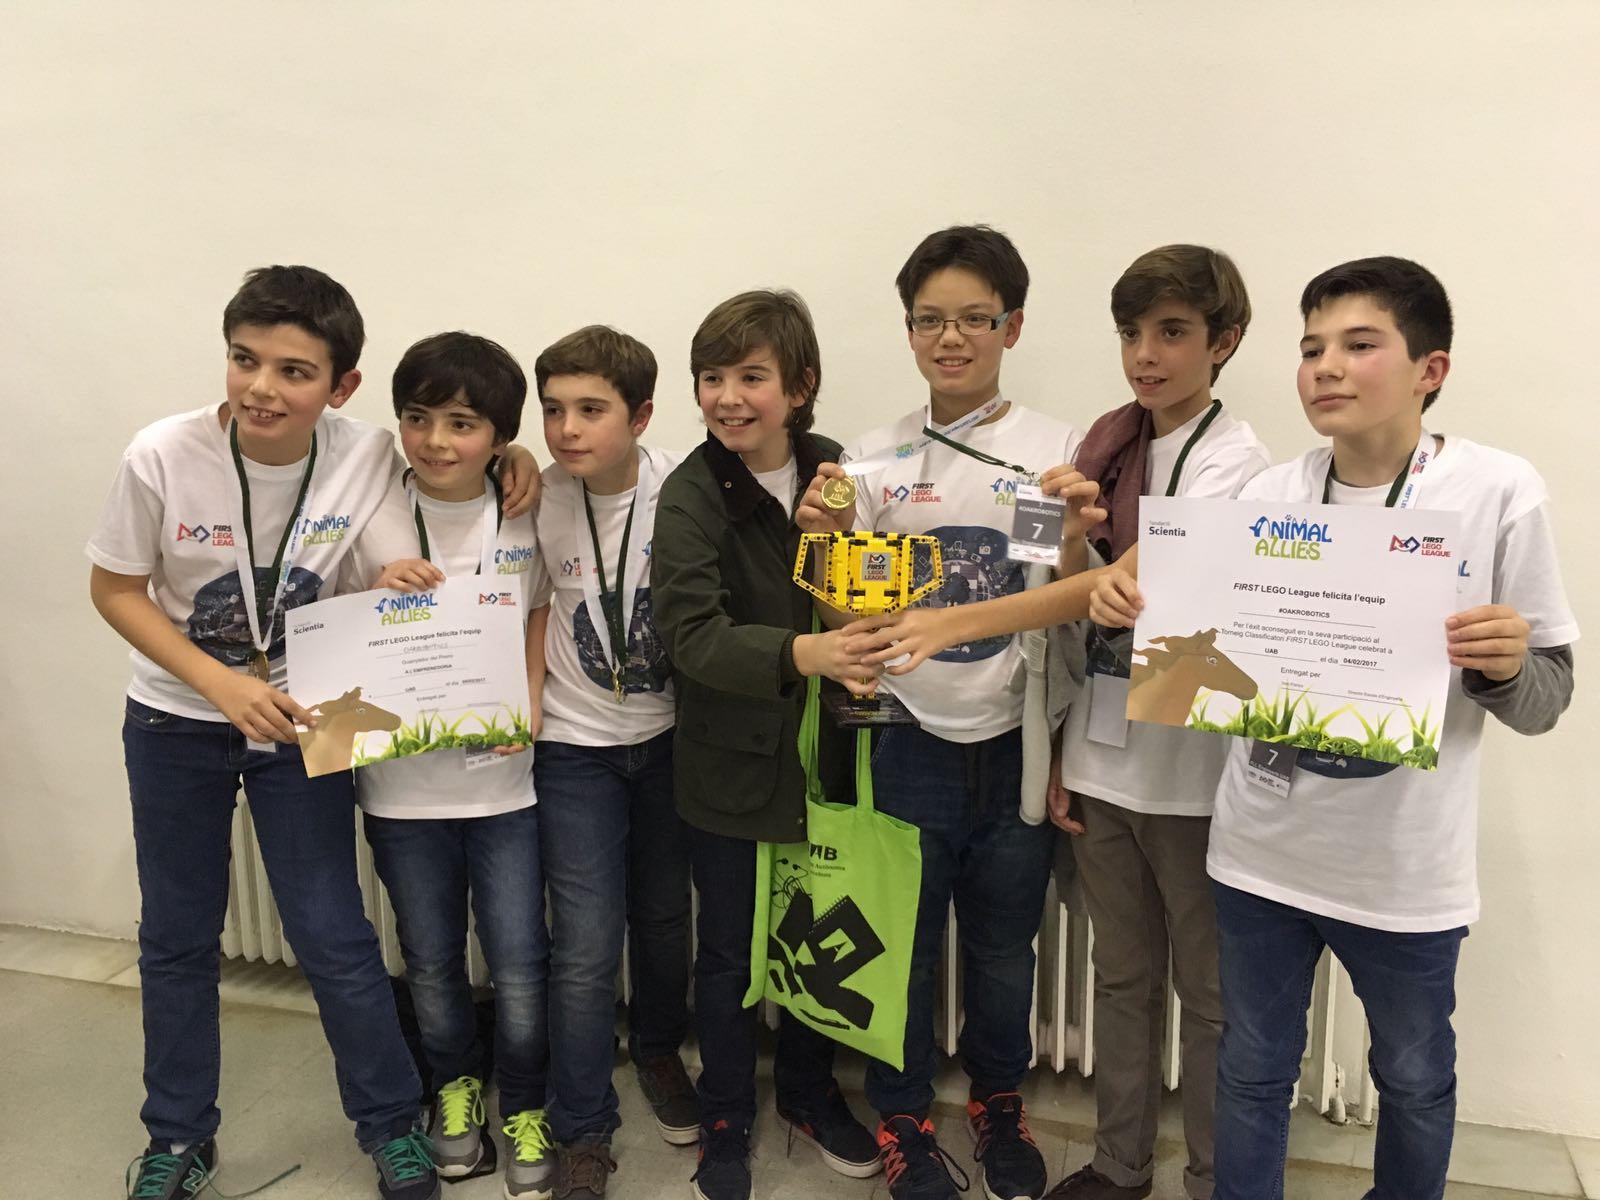 Diez estudiantes de 1º ESO son premiados por un dispensador de comida para mascotas automatizado